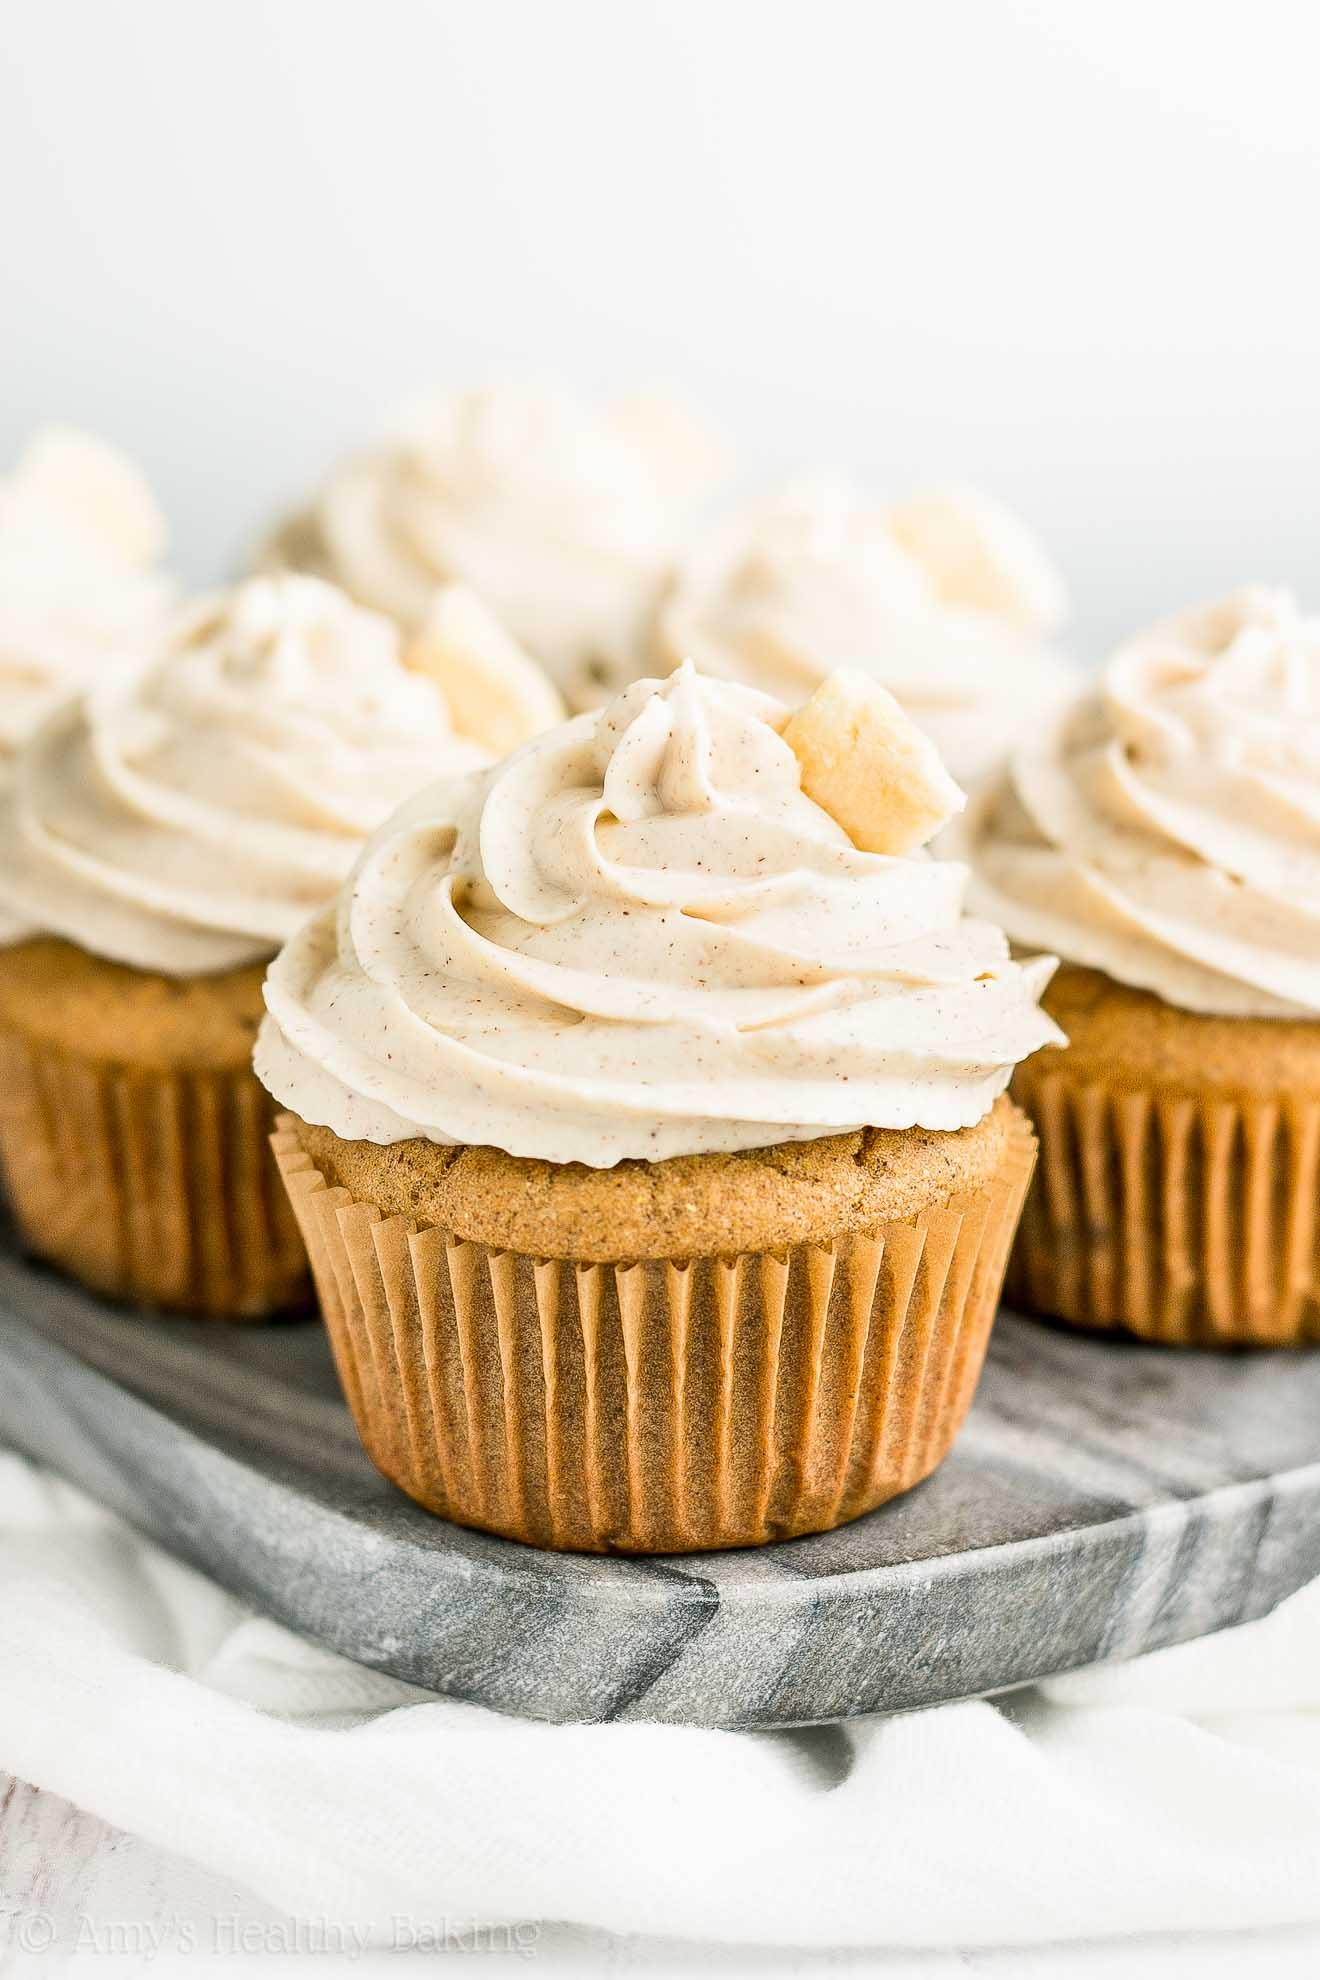 Healthy Cinnamon Apple Cupcakes | Amy's Healthy Baking